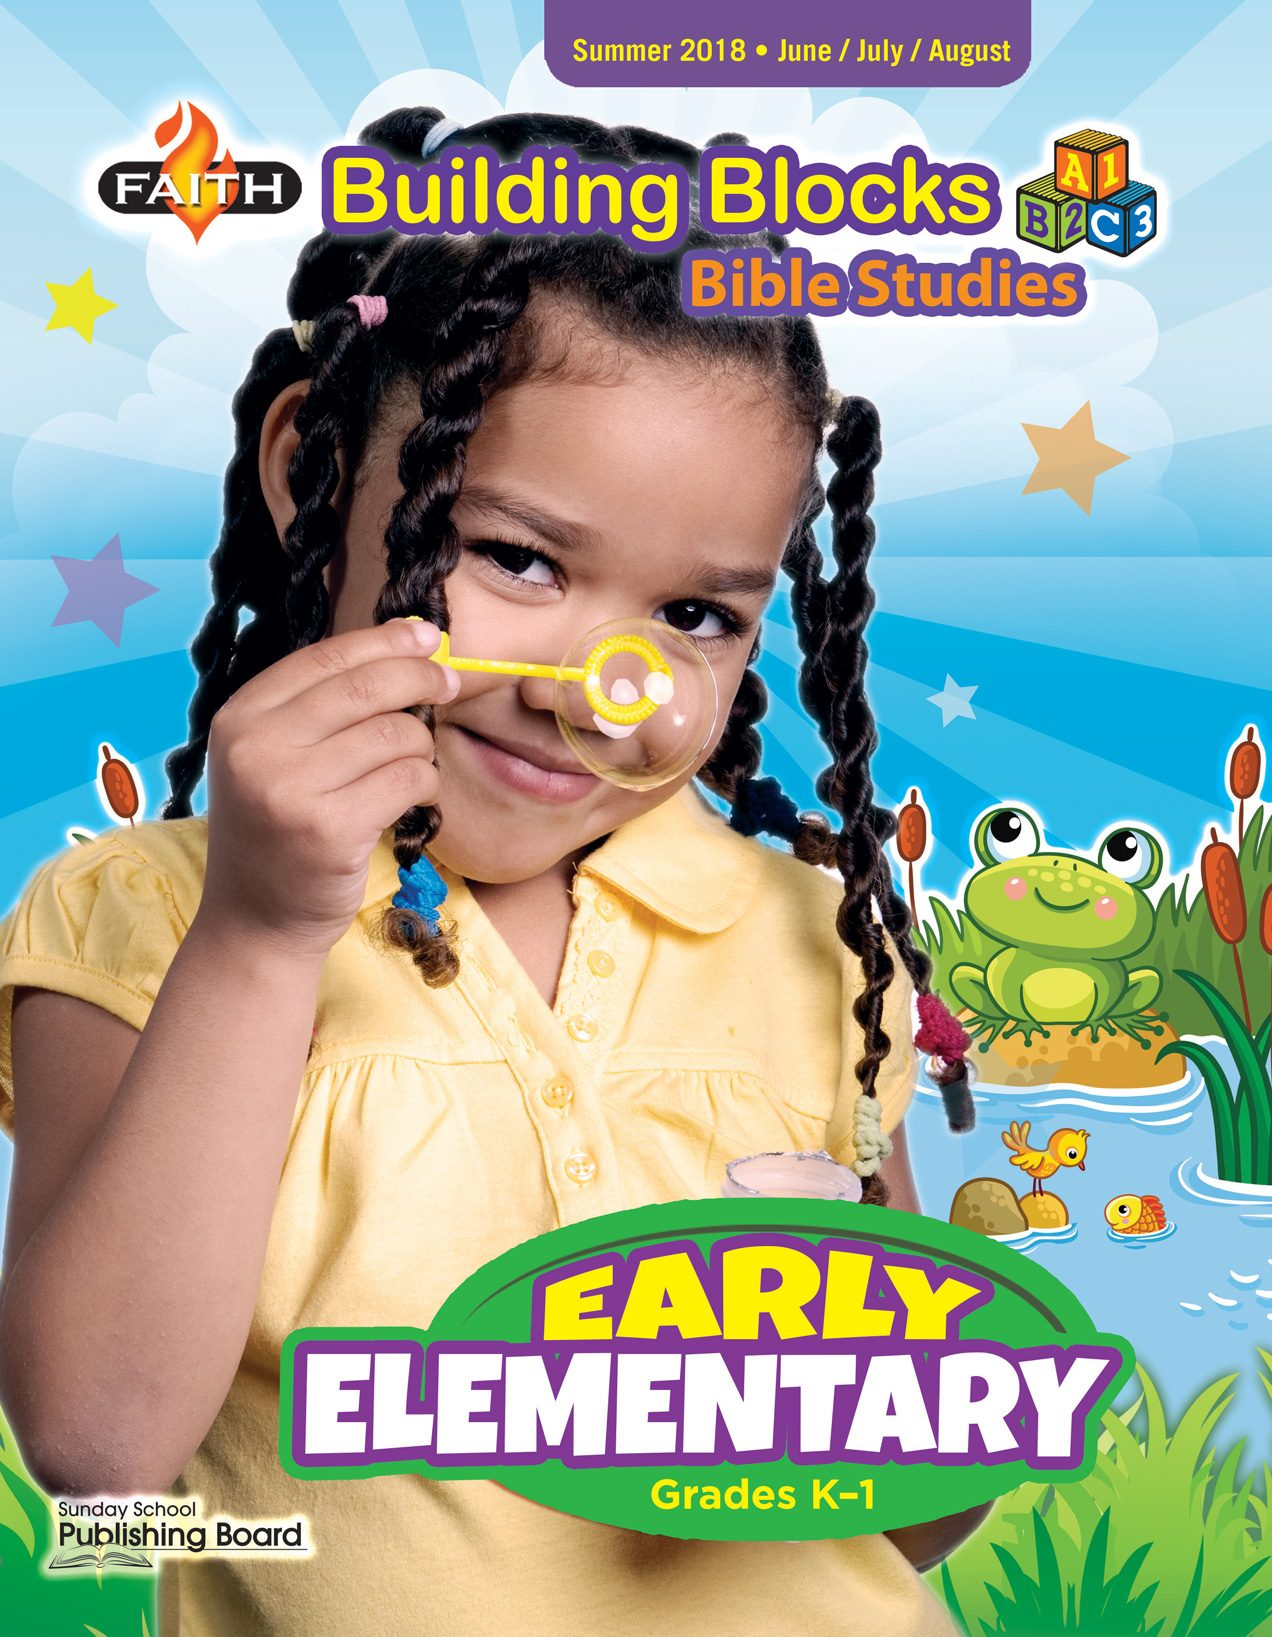 Faith Building Blocks Bible Studies, Early Elementary for Grades K-1 (Summer 2018)-Digital Edition